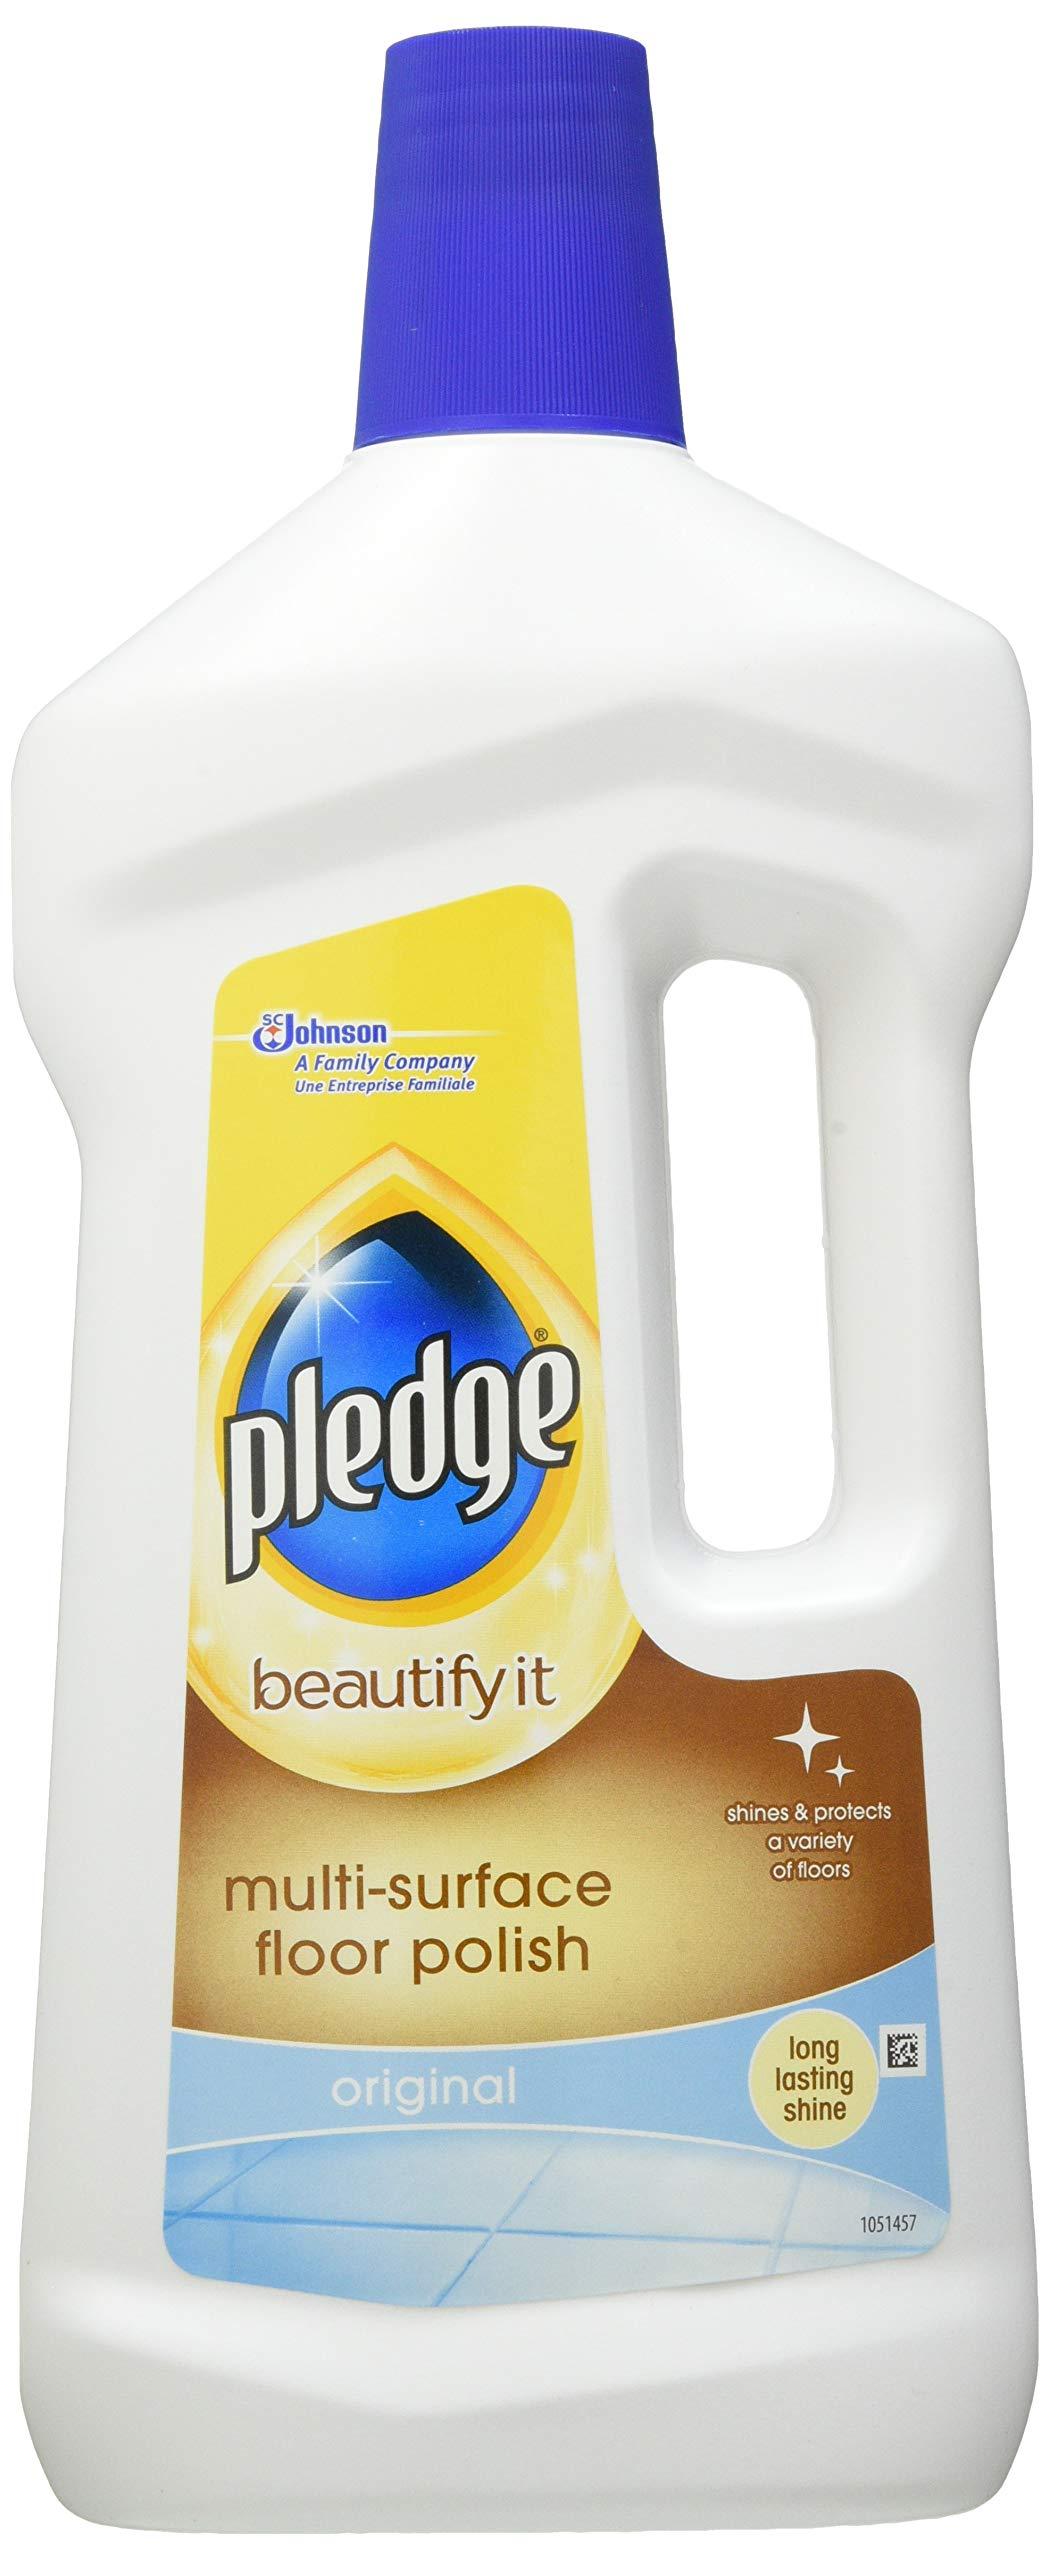 Pledge Beautify It, Multi-Surface Floor Polish Original, 750ml, Pack of 6